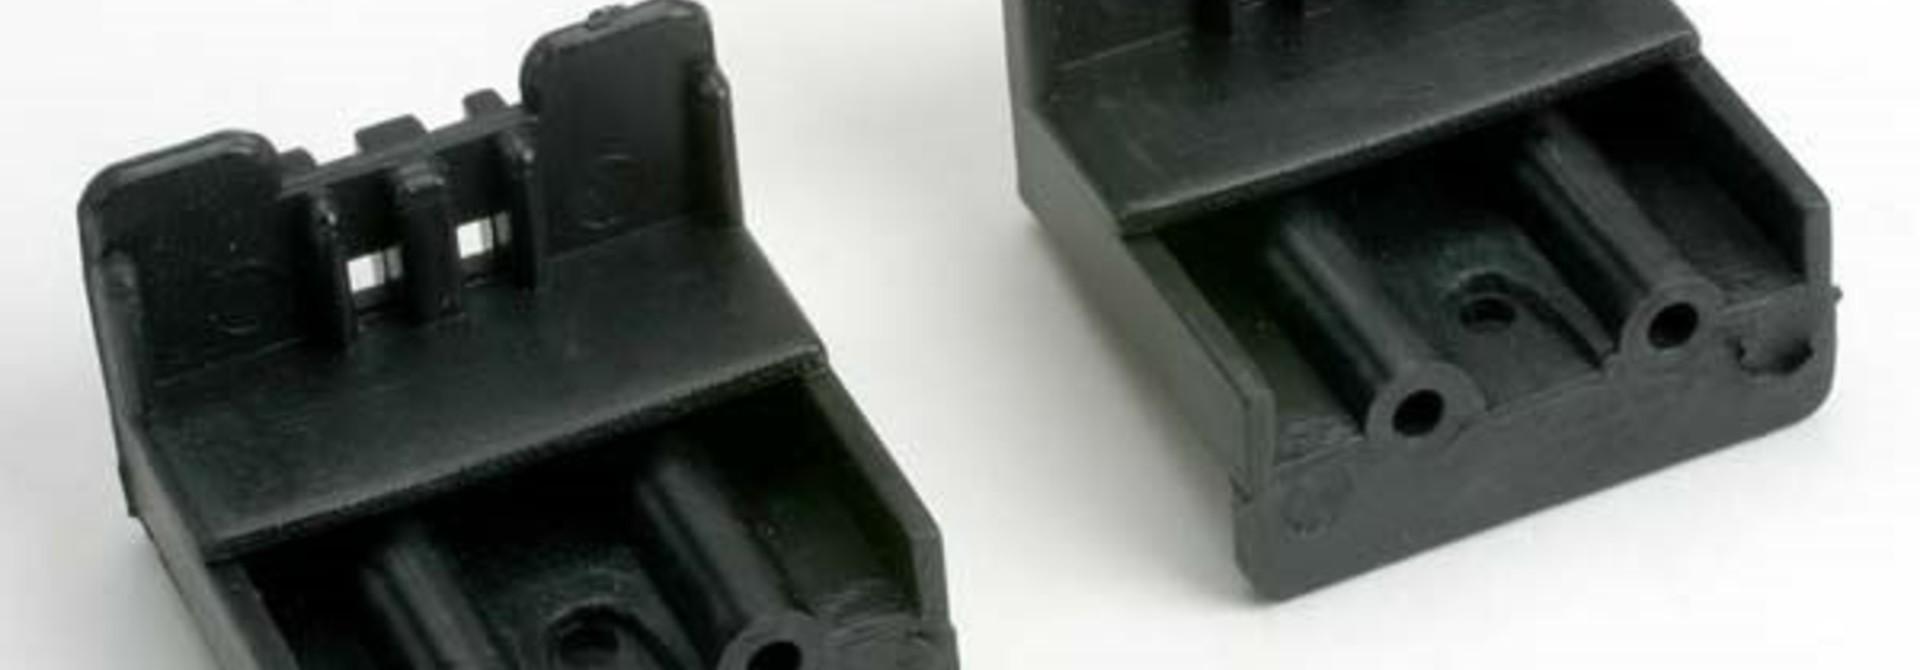 Battery stay brackets (2), TRX1225